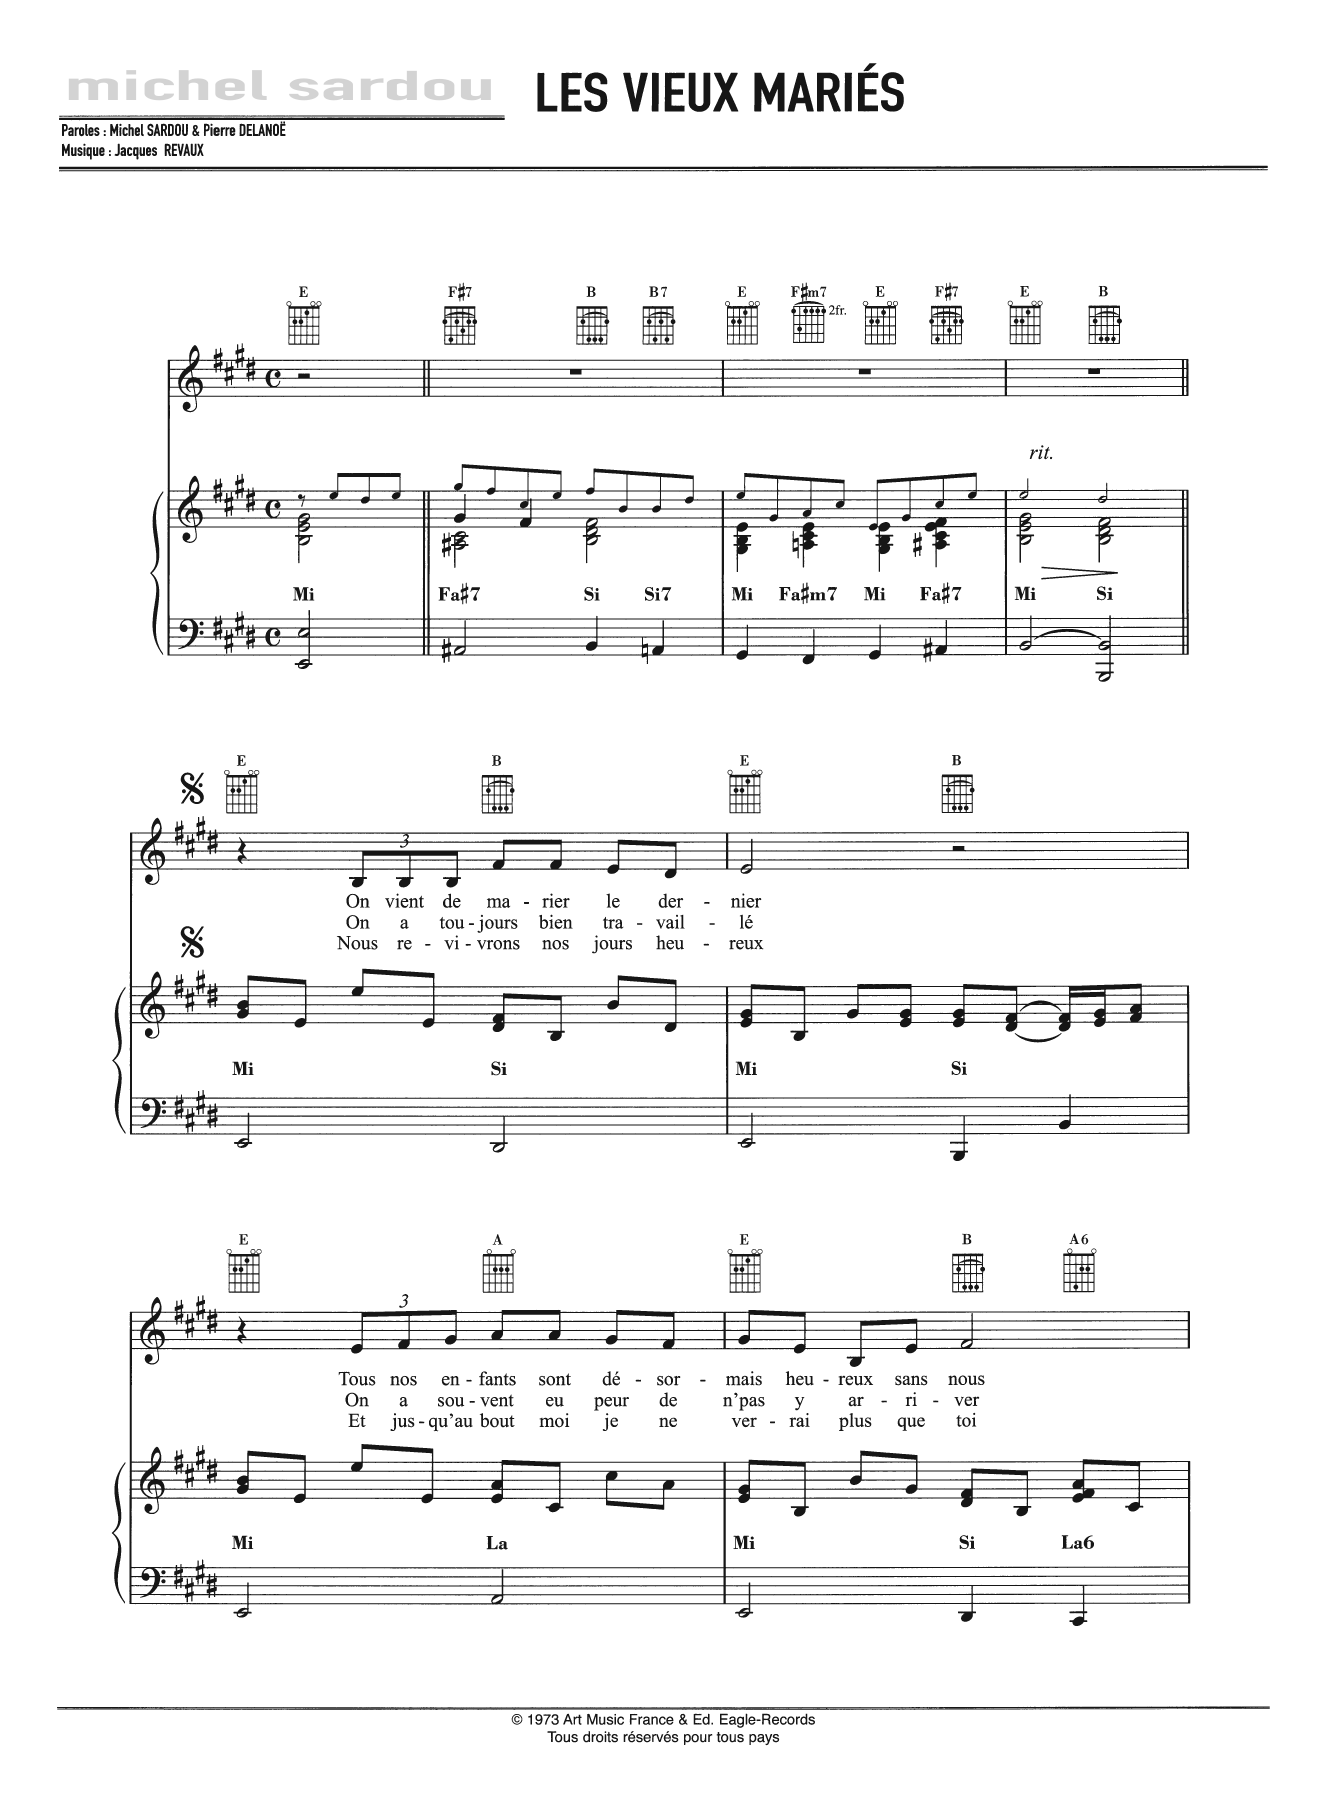 Les Vieux Maries Sheet Music